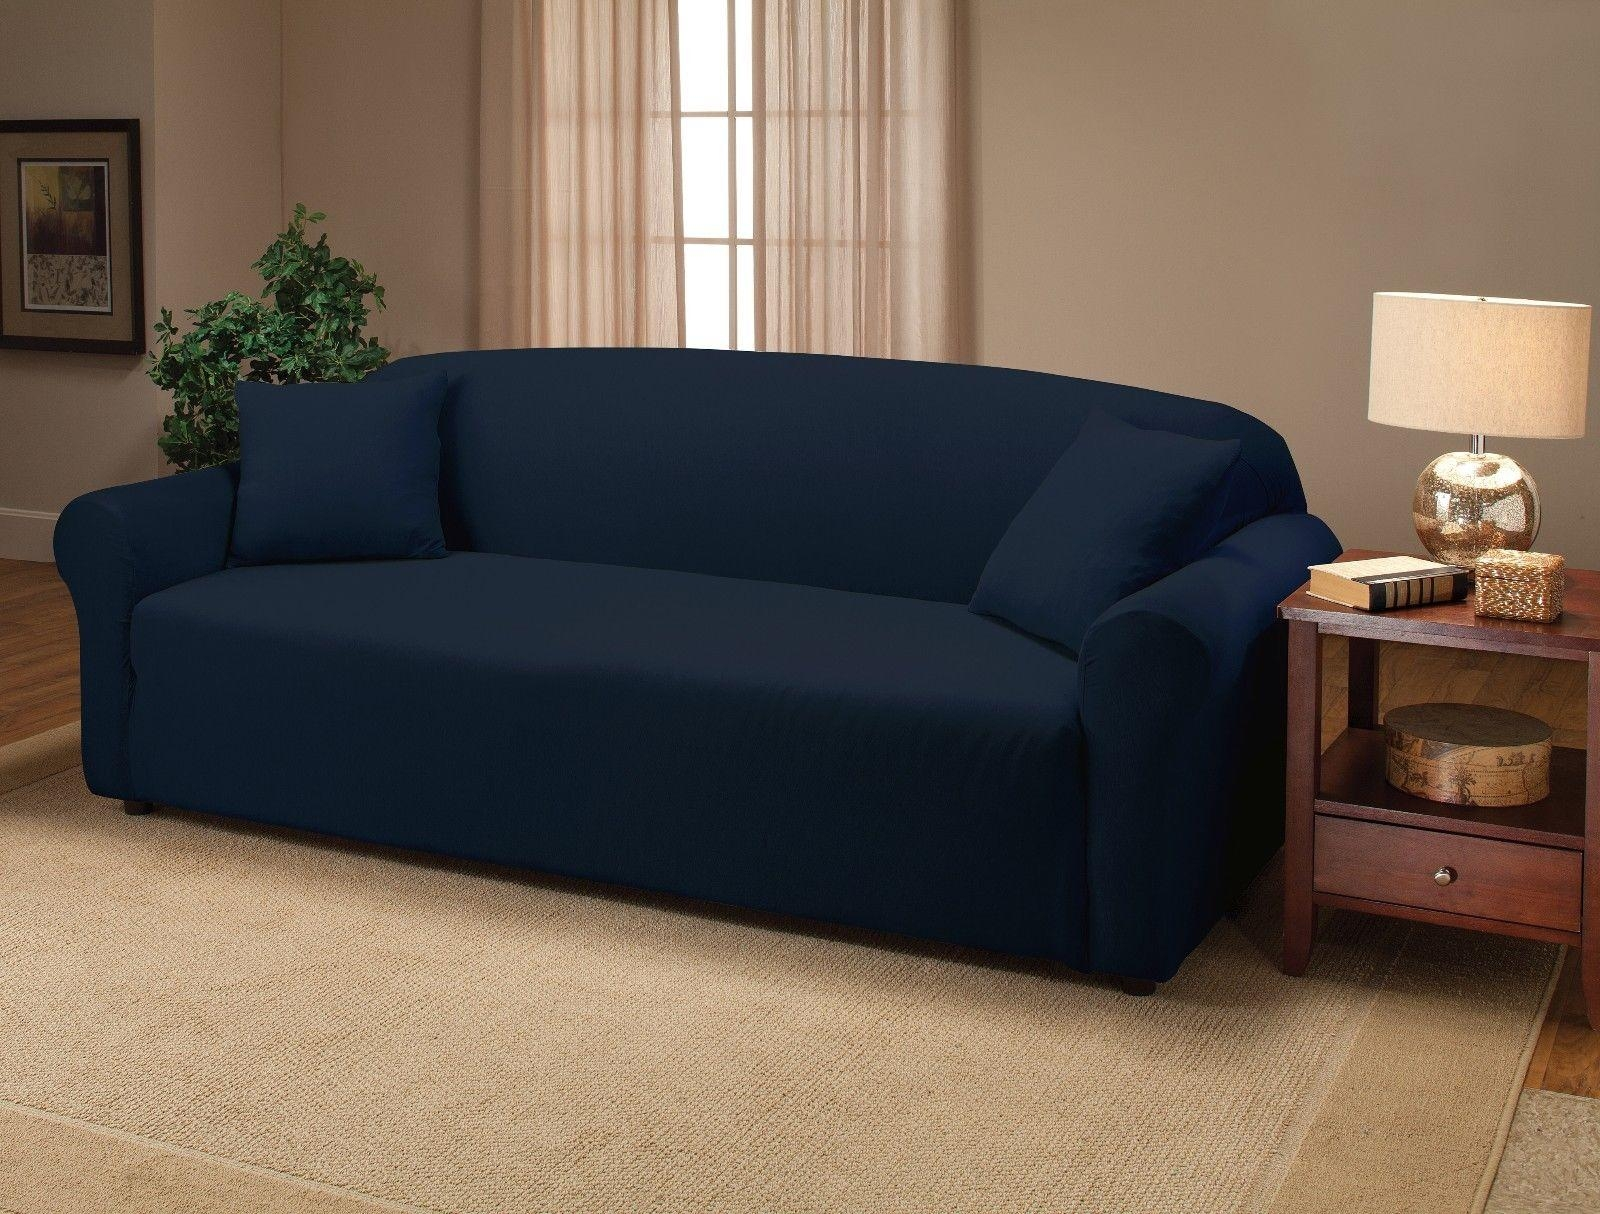 navy sofa cover custom houston tx 20 inspirations blue slipcovers ideas